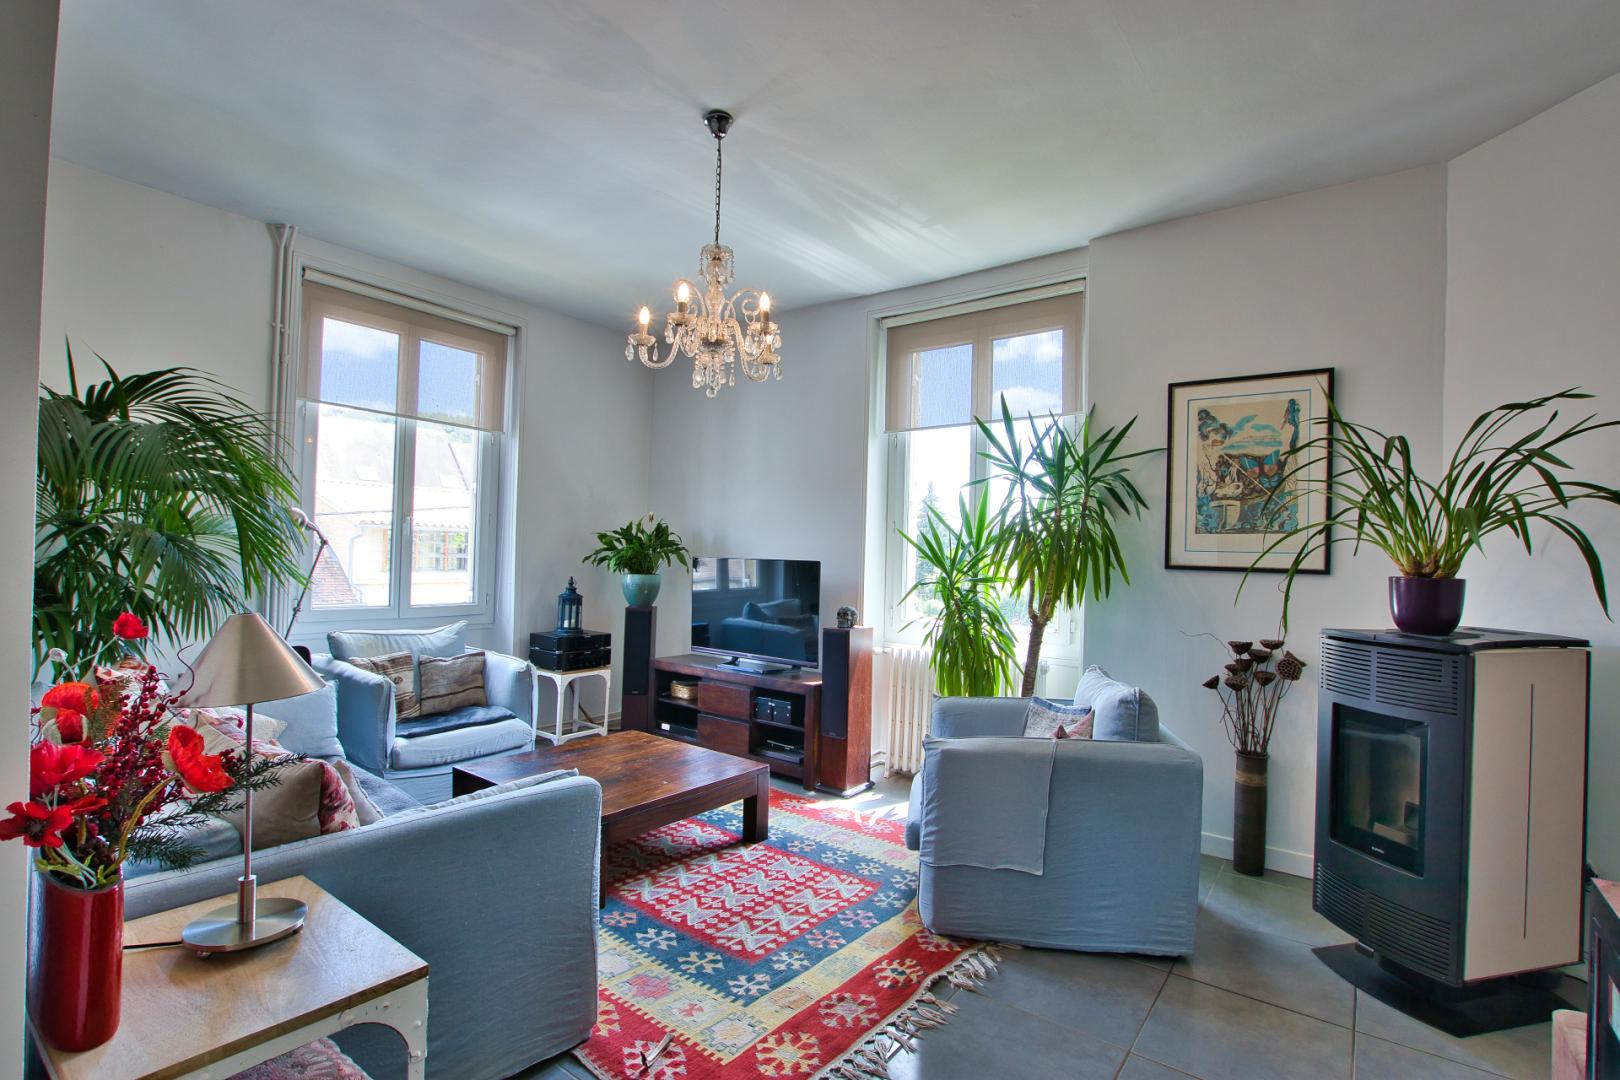 CENTRE SARLAT -Appartement avec jaccuzi, terrasse